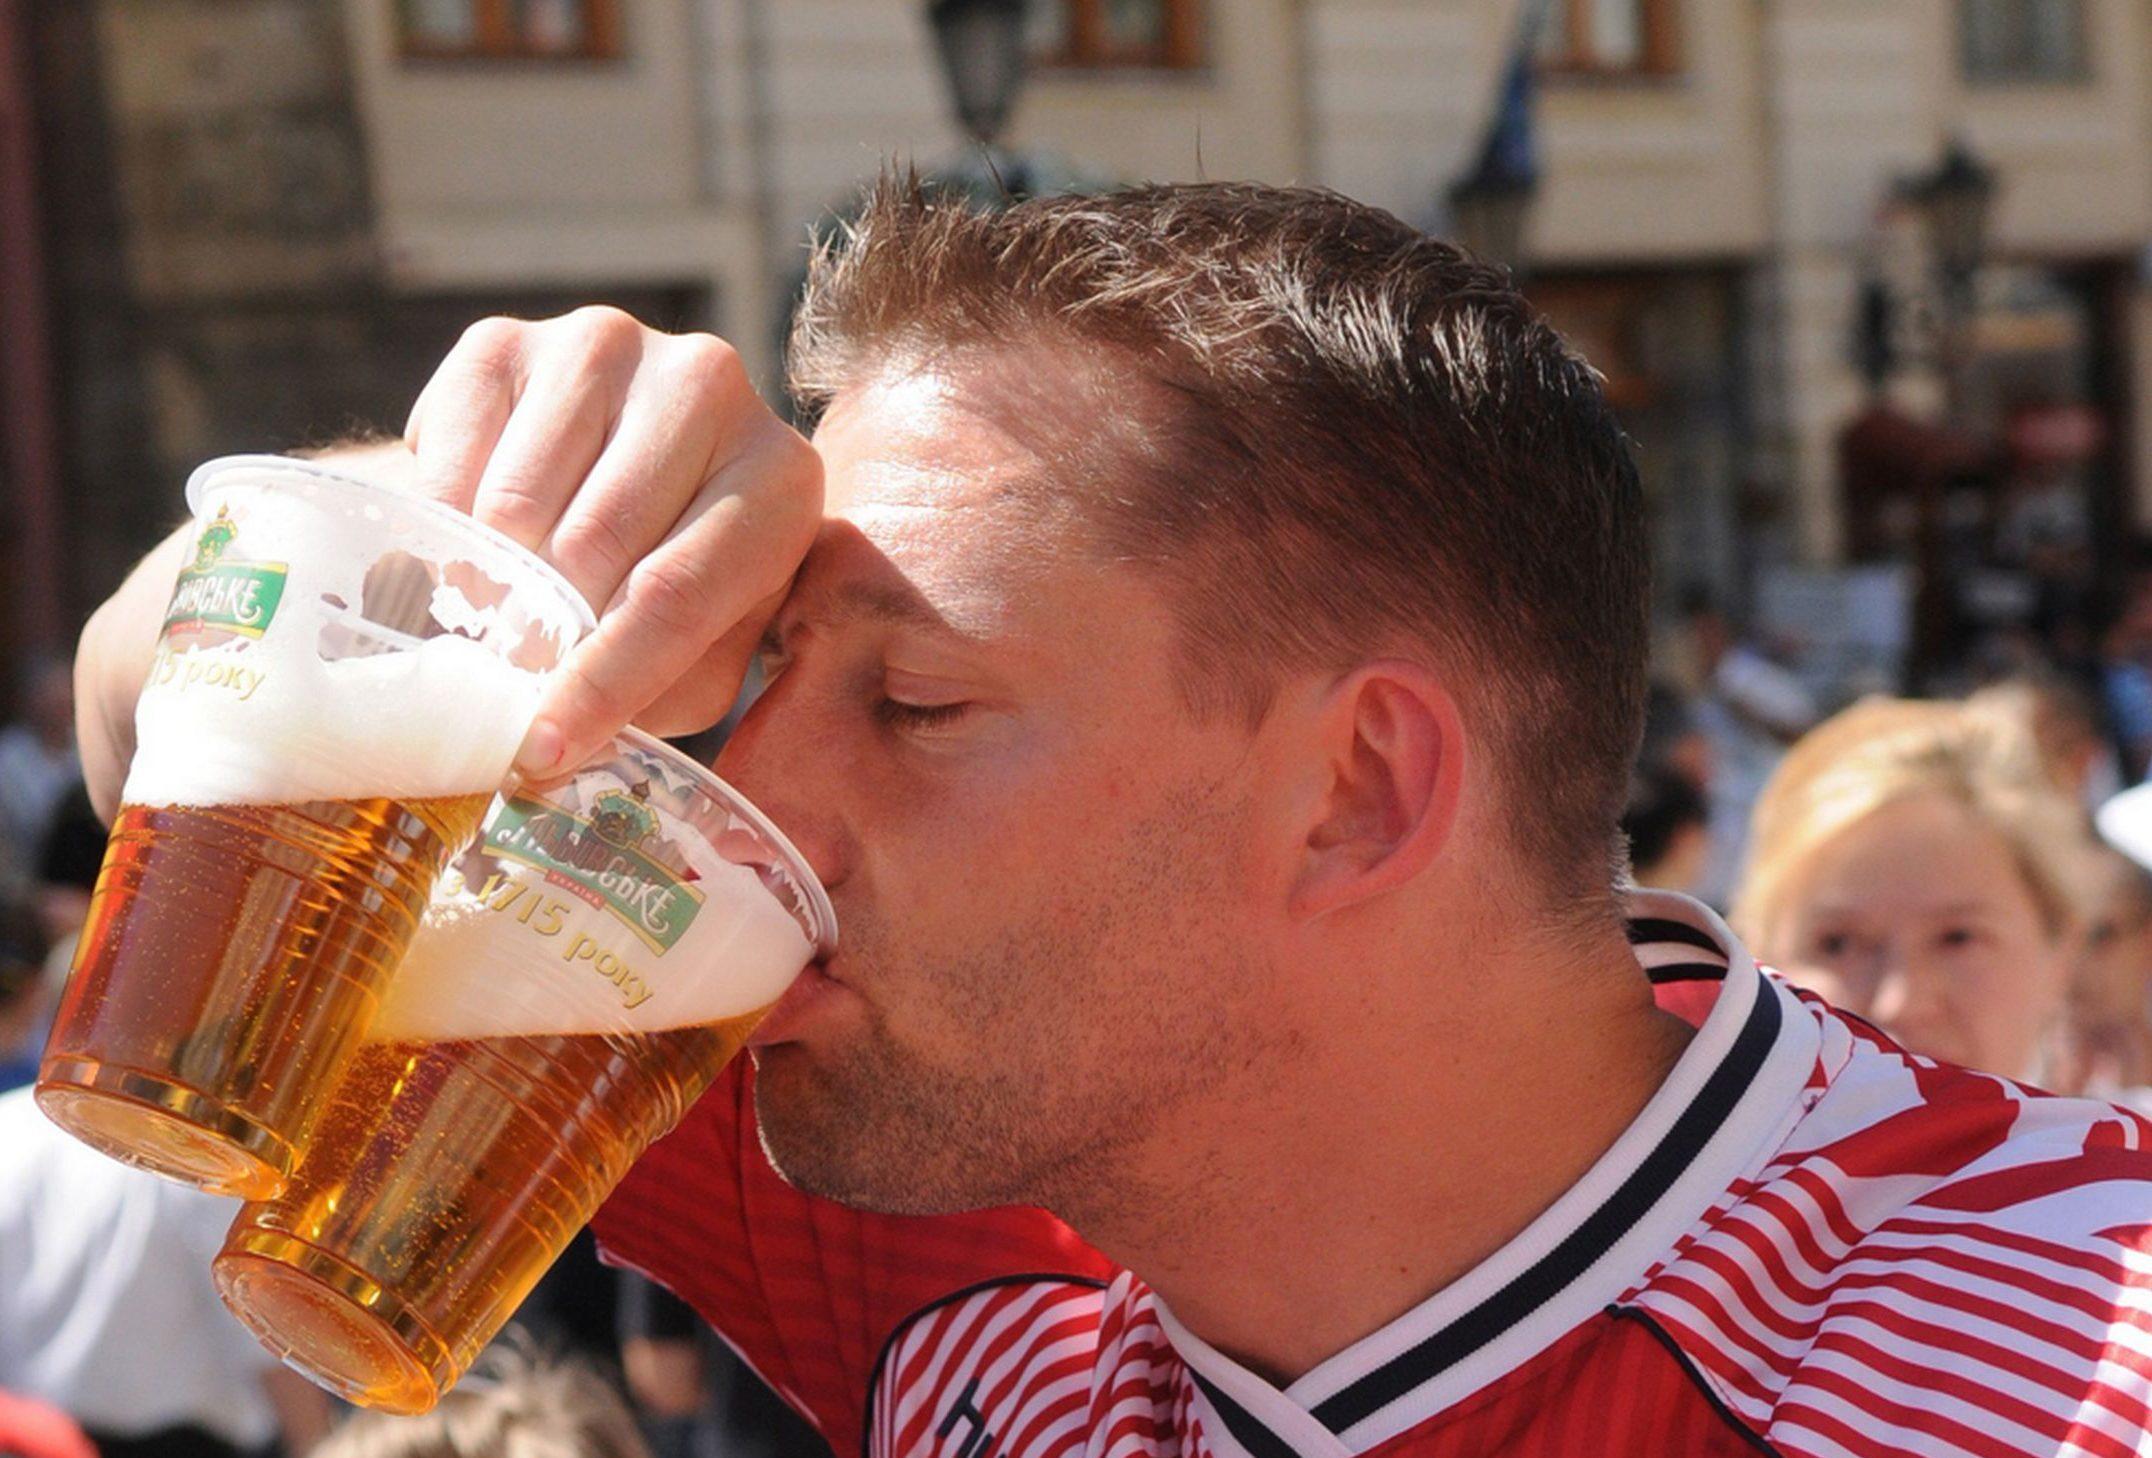 Пиян футболен коментатор заваля думи в ефир! Наздаре, майсторе (ВИДЕО)